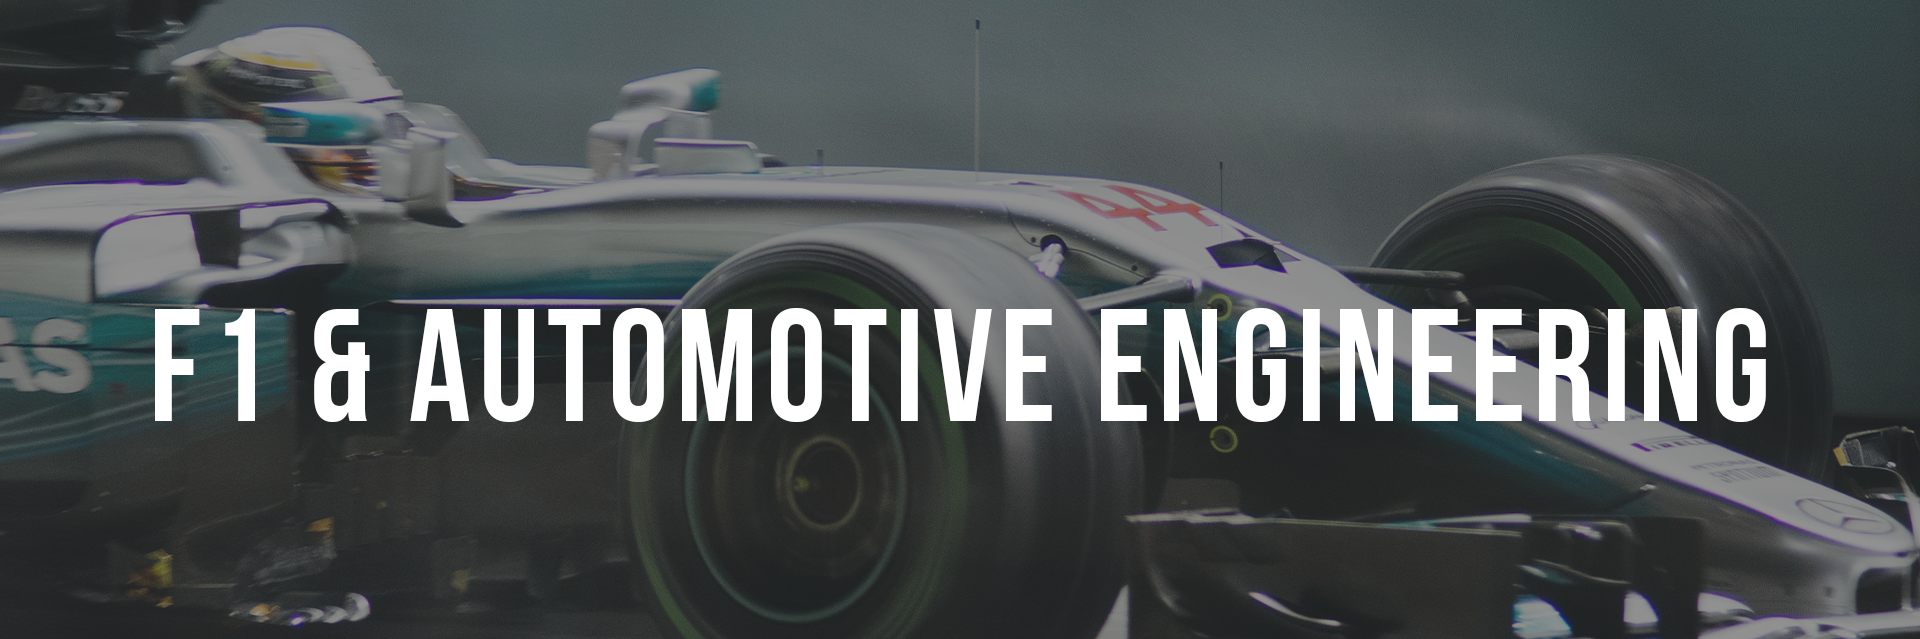 F1 & Automotive Engineering